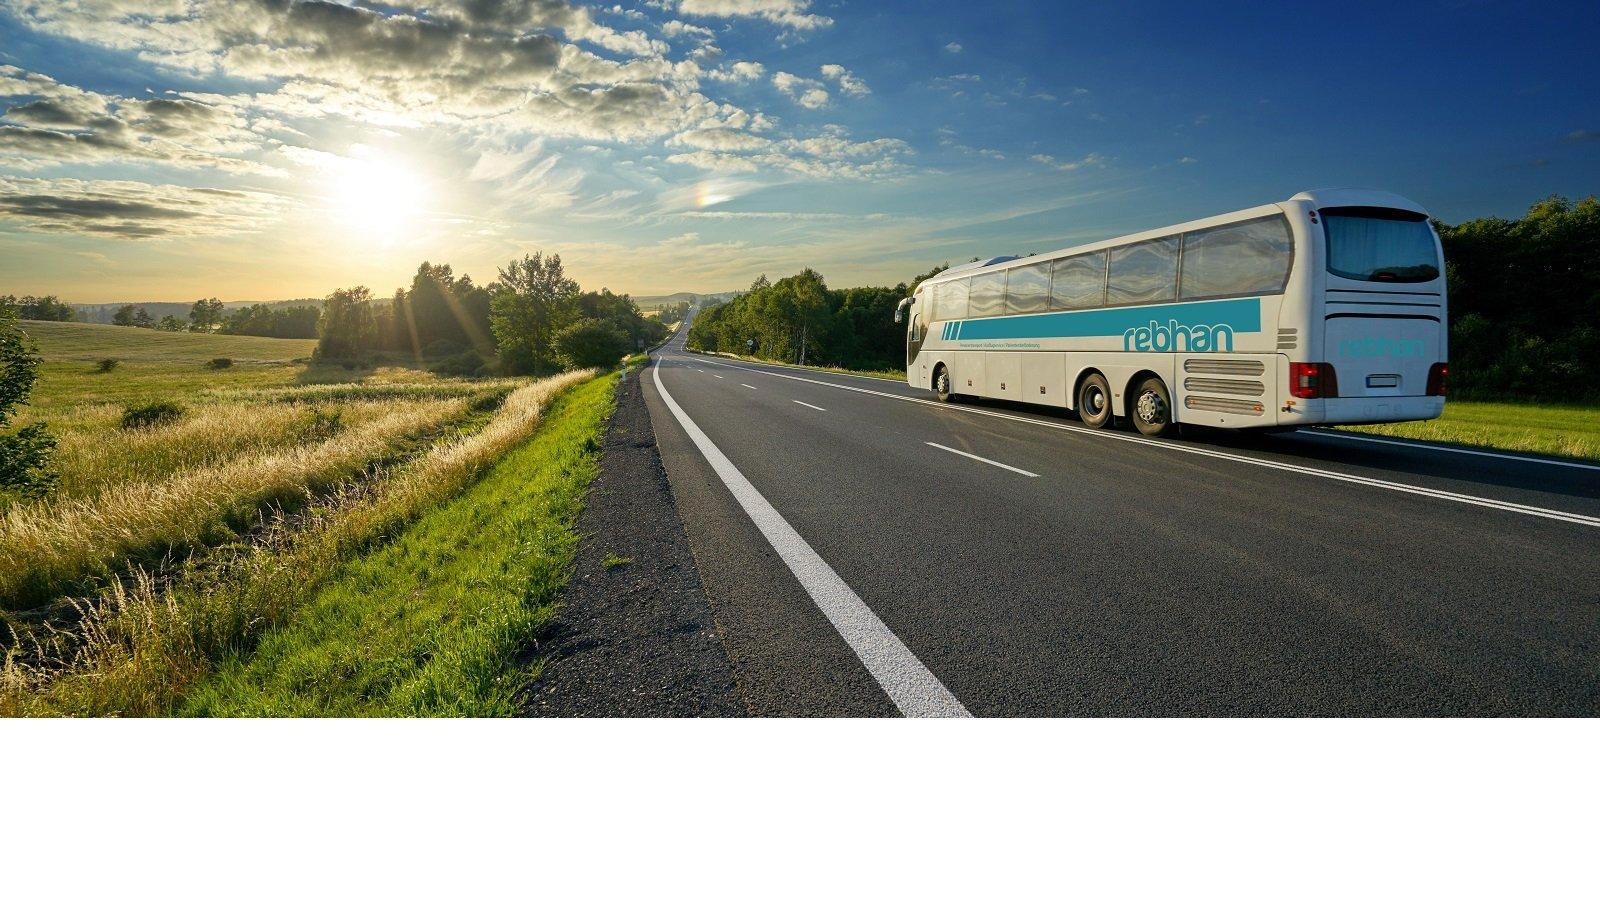 Rebhan Personentransport Bus Fahren